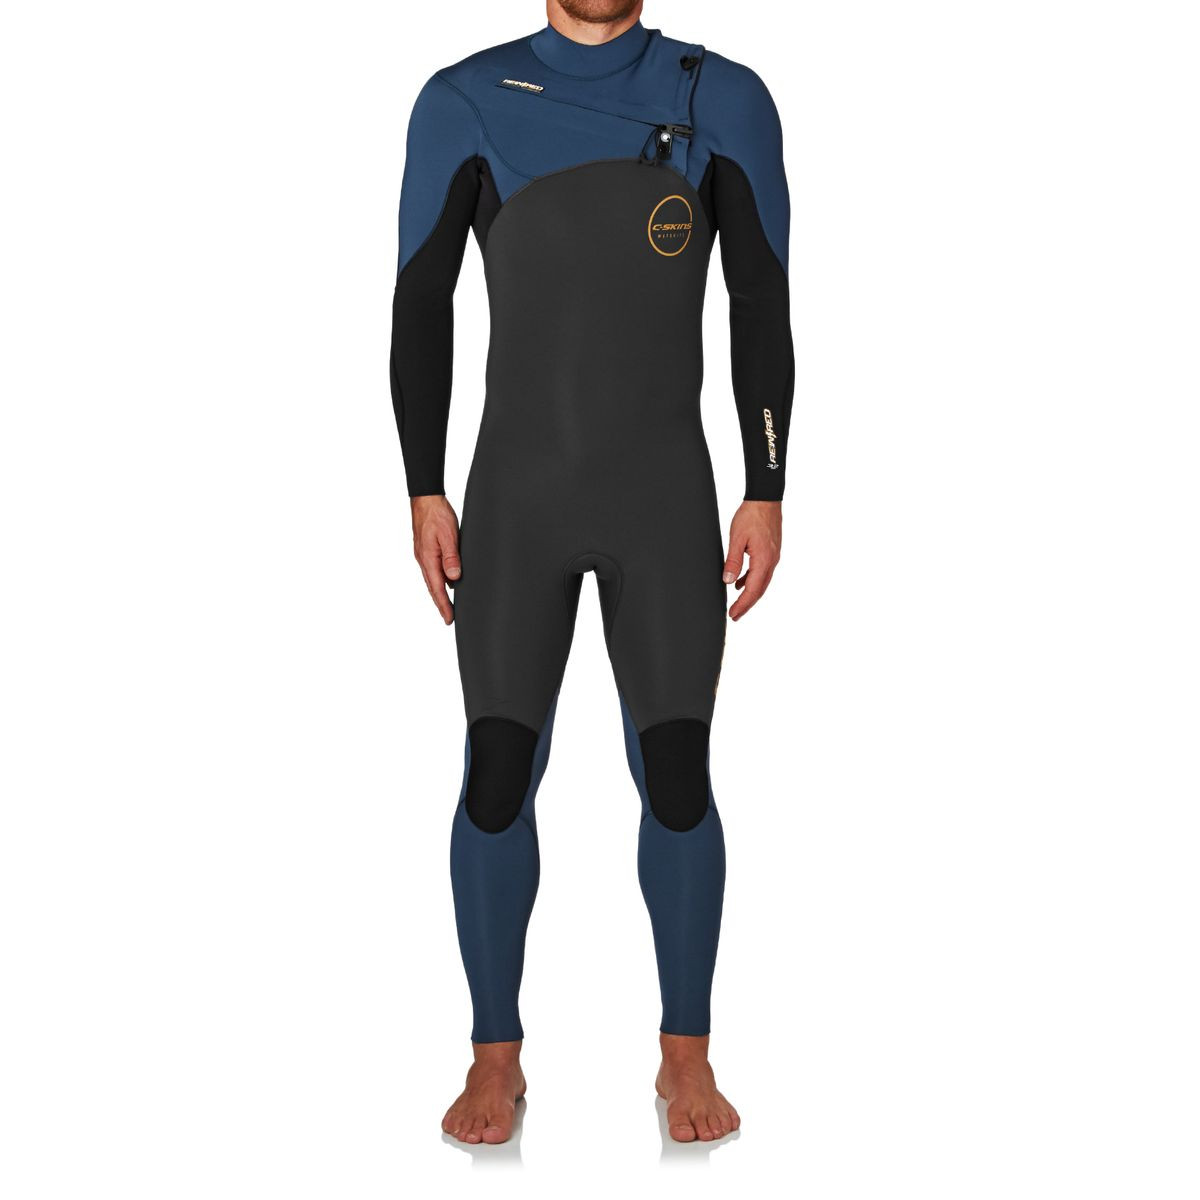 C-Skins Re-Wired 3/2mm 2017 Chest Zip Wetsuit - Gunmetal/ Black/ Steel Blue